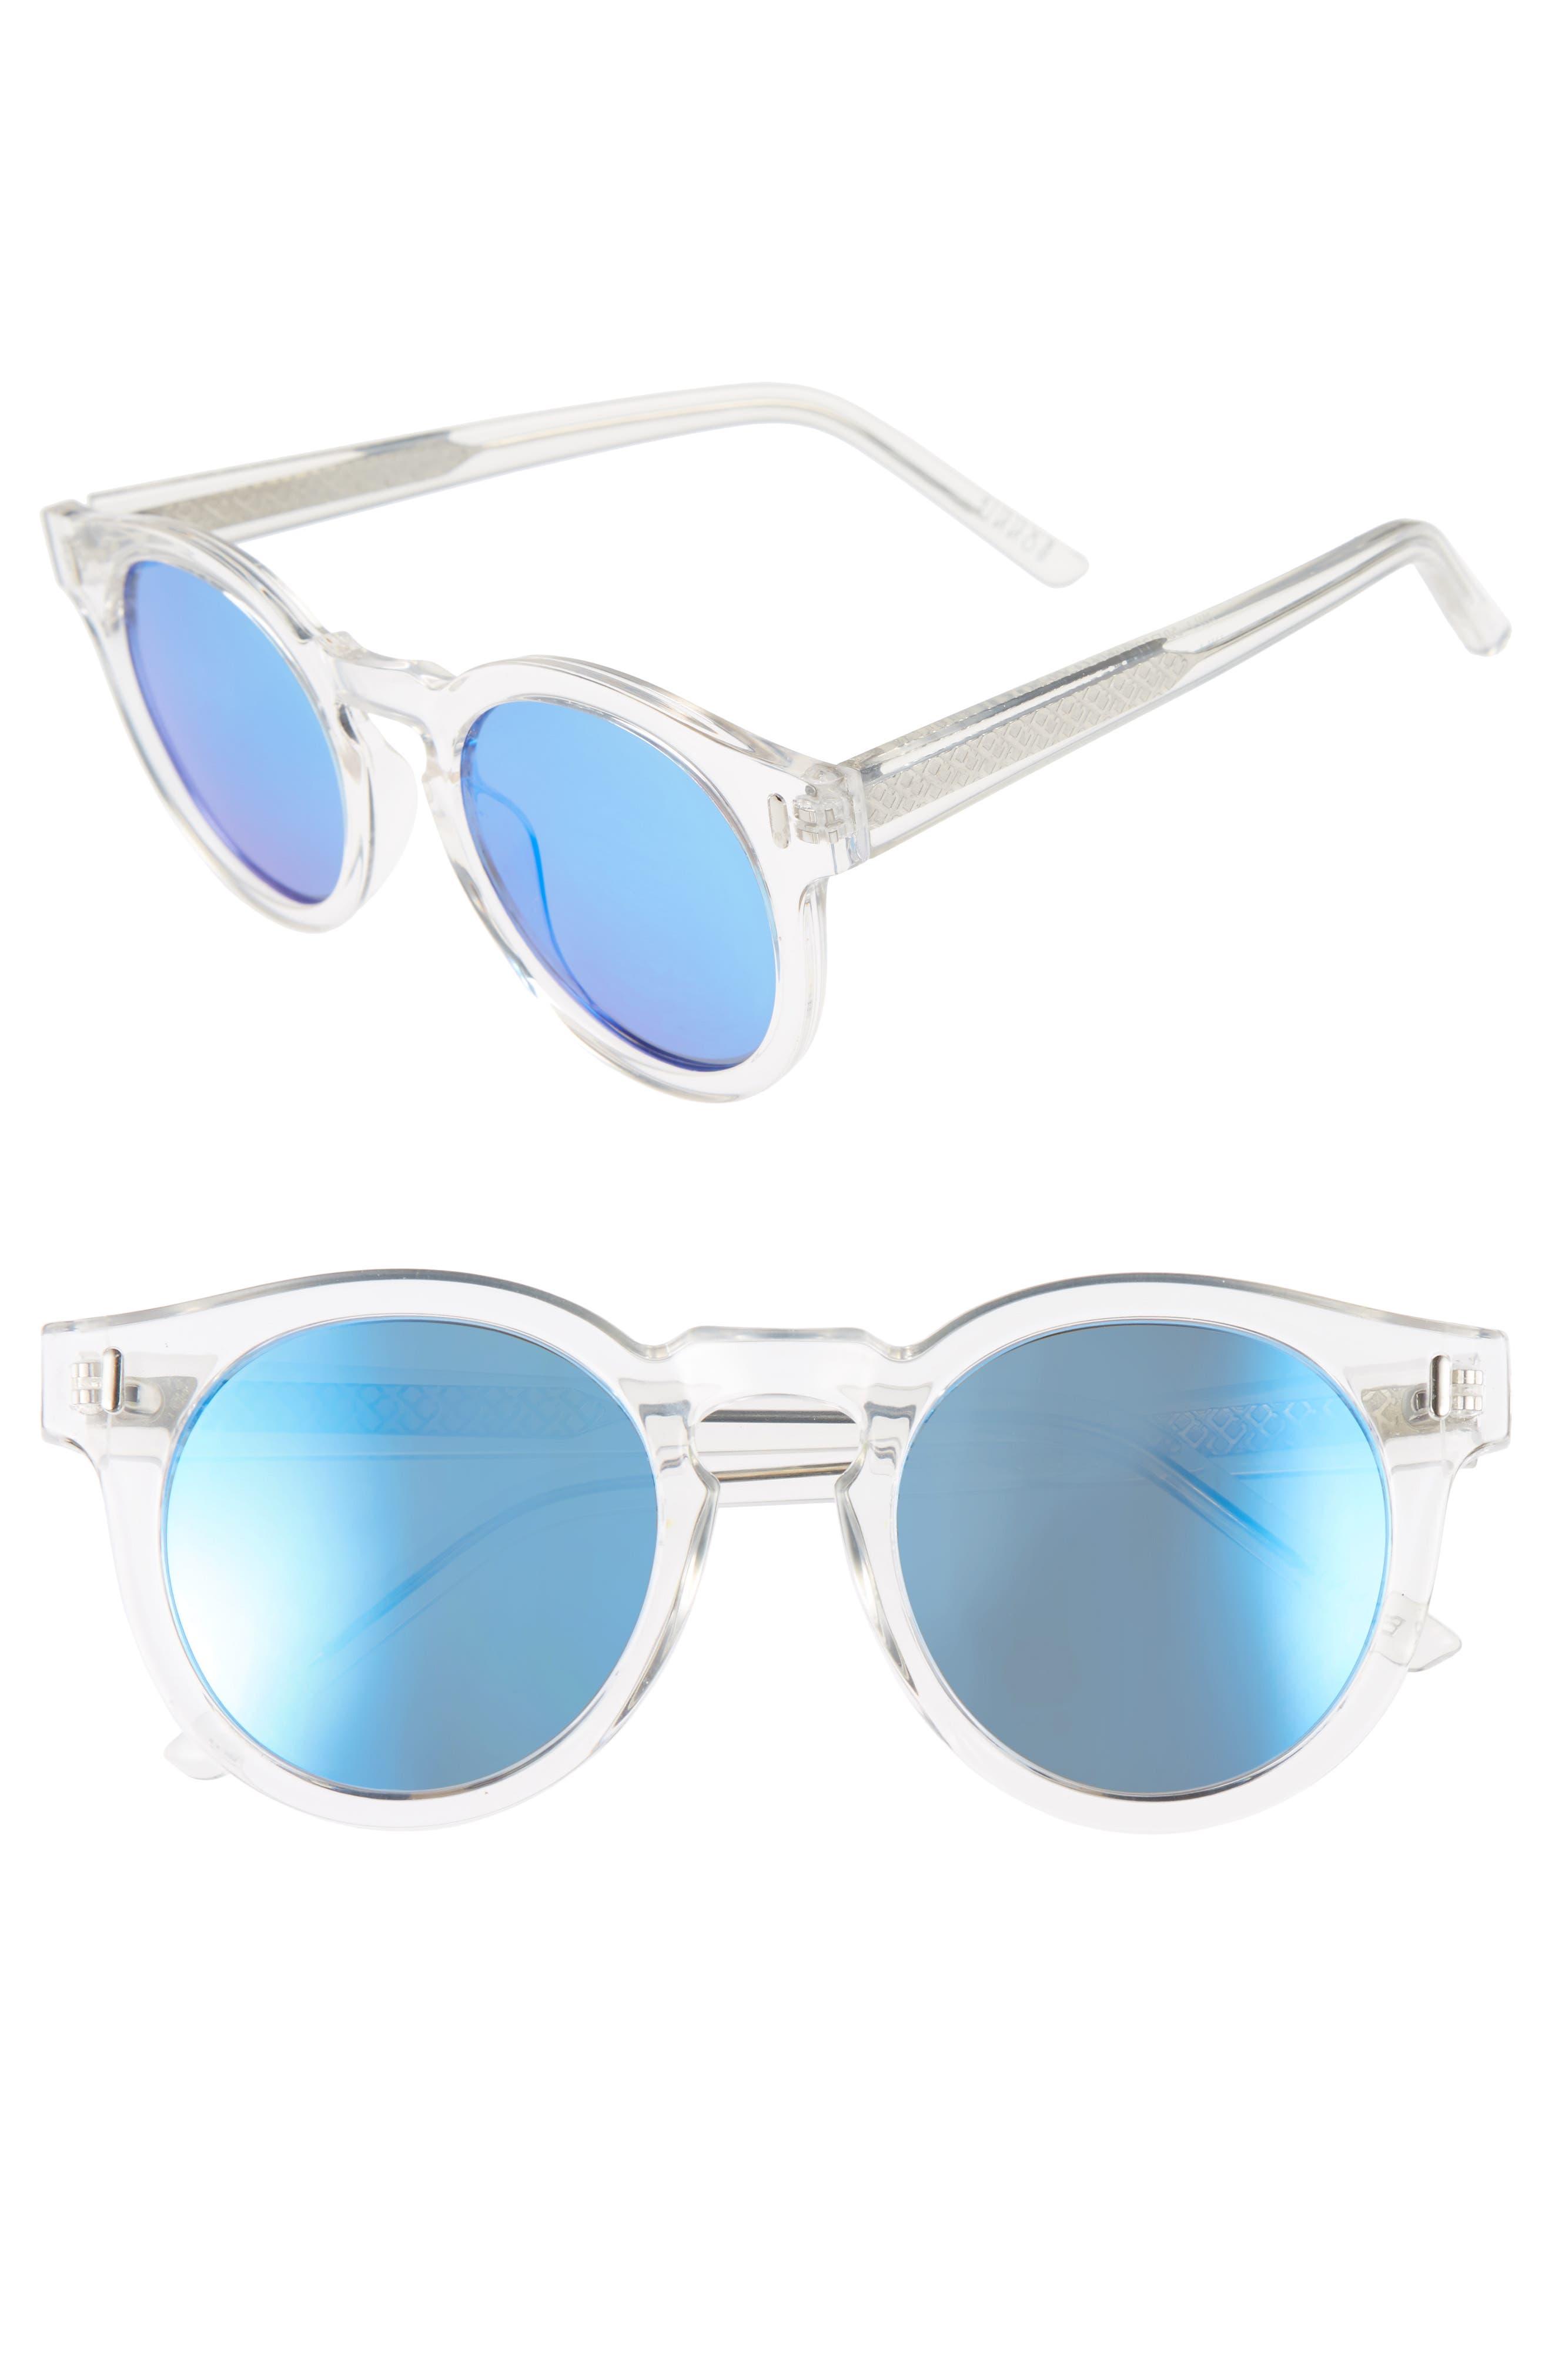 Hill 50mm Polarized Sunglasses,                             Main thumbnail 1, color,                             Ocean Eyes Blue